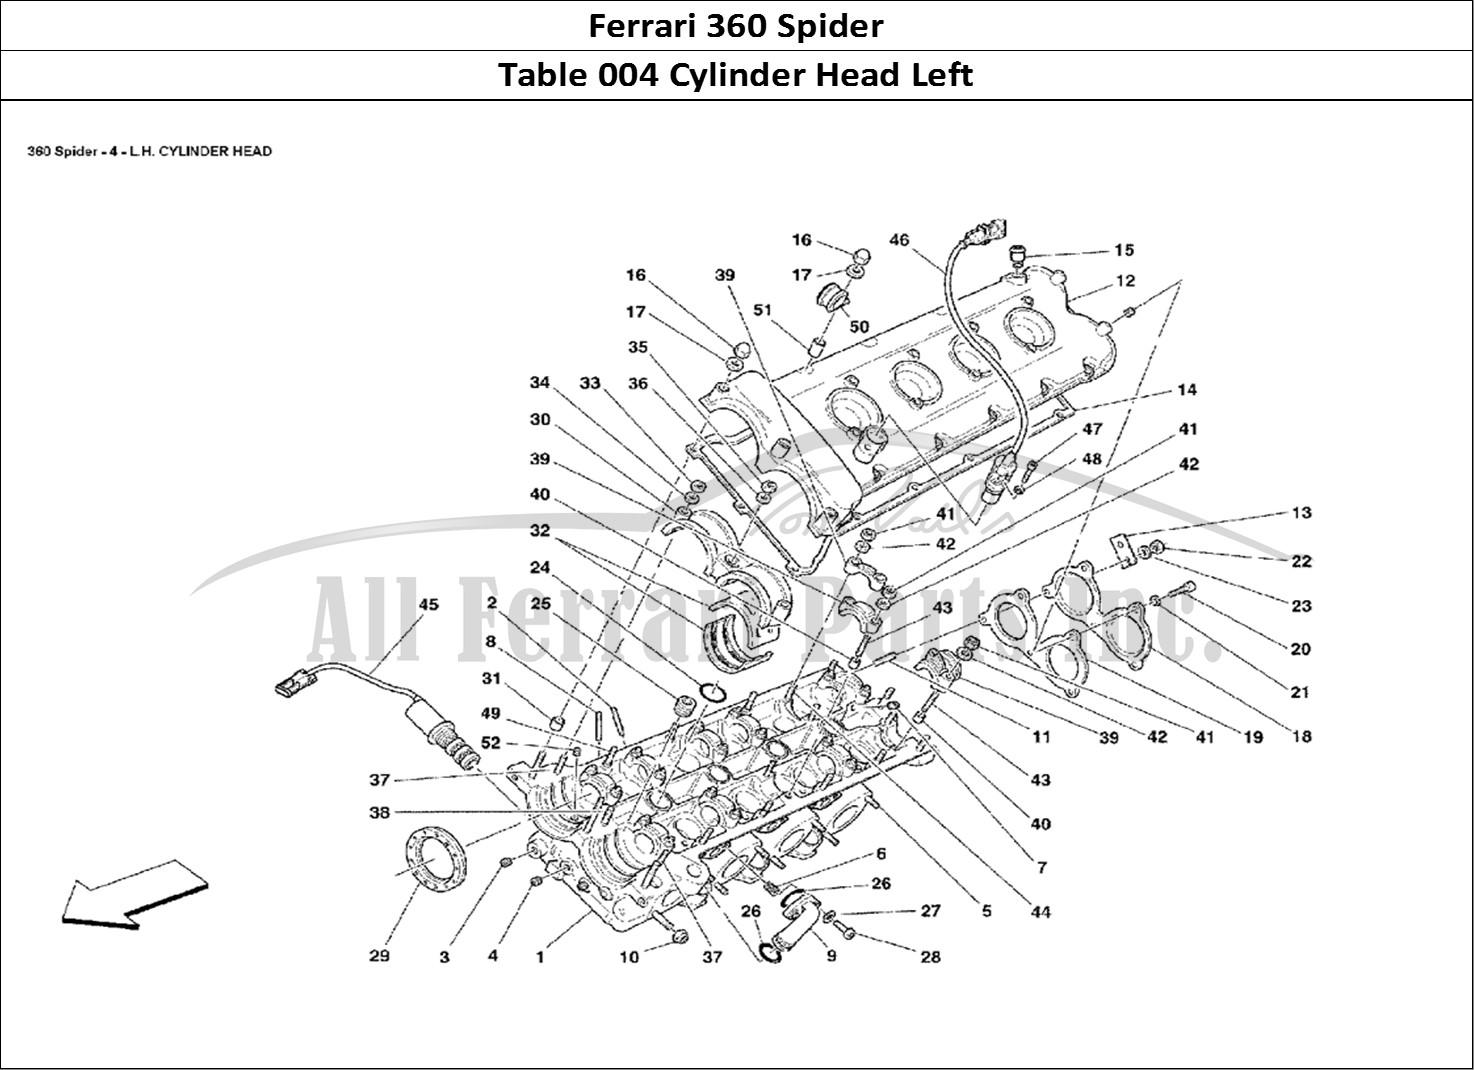 Buy Original Ferrari 360 Spider 004 Cylinder Head Left